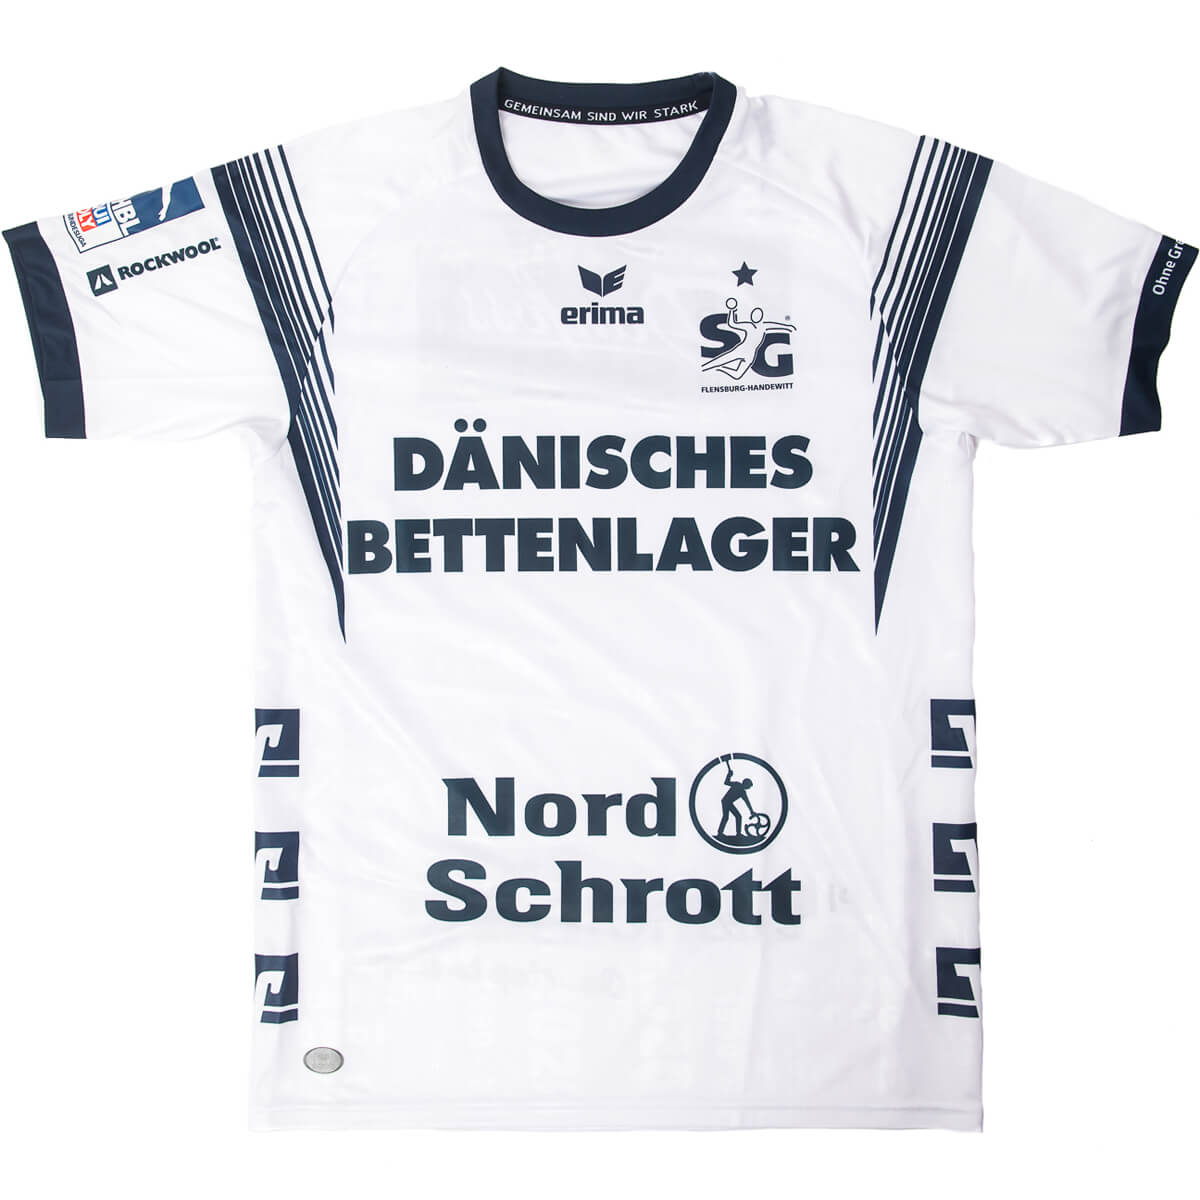 Erima SG Flensburg-Handewitt 20/21 Håndboldtrøje Herre